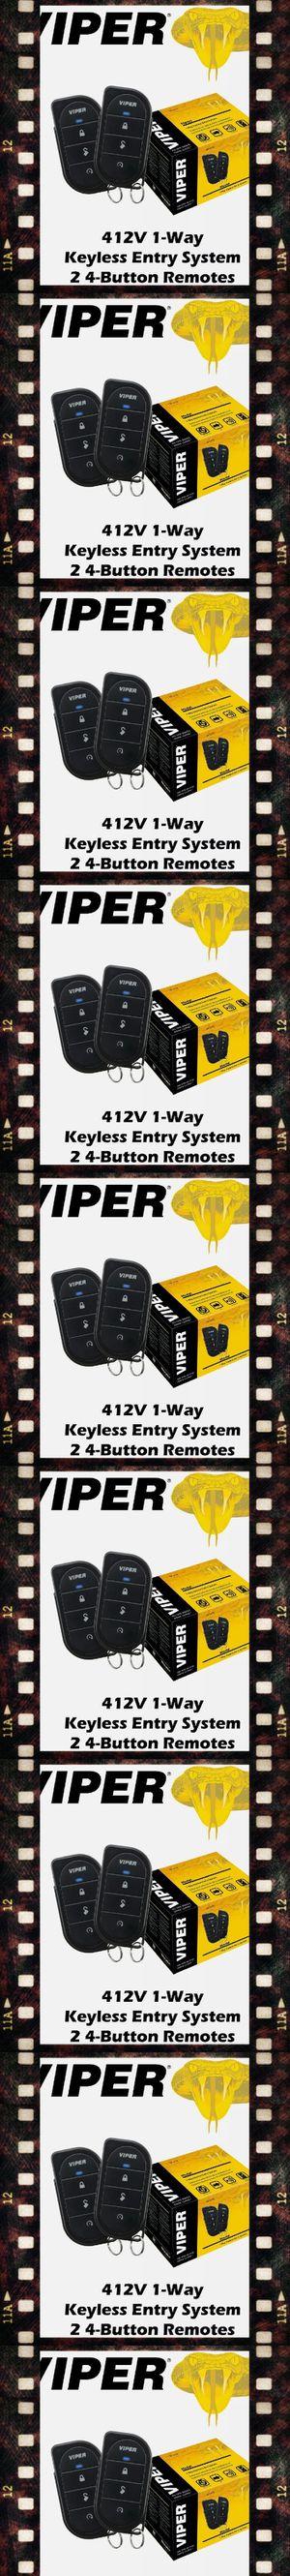 Viper alarm for Sale in San Diego, CA